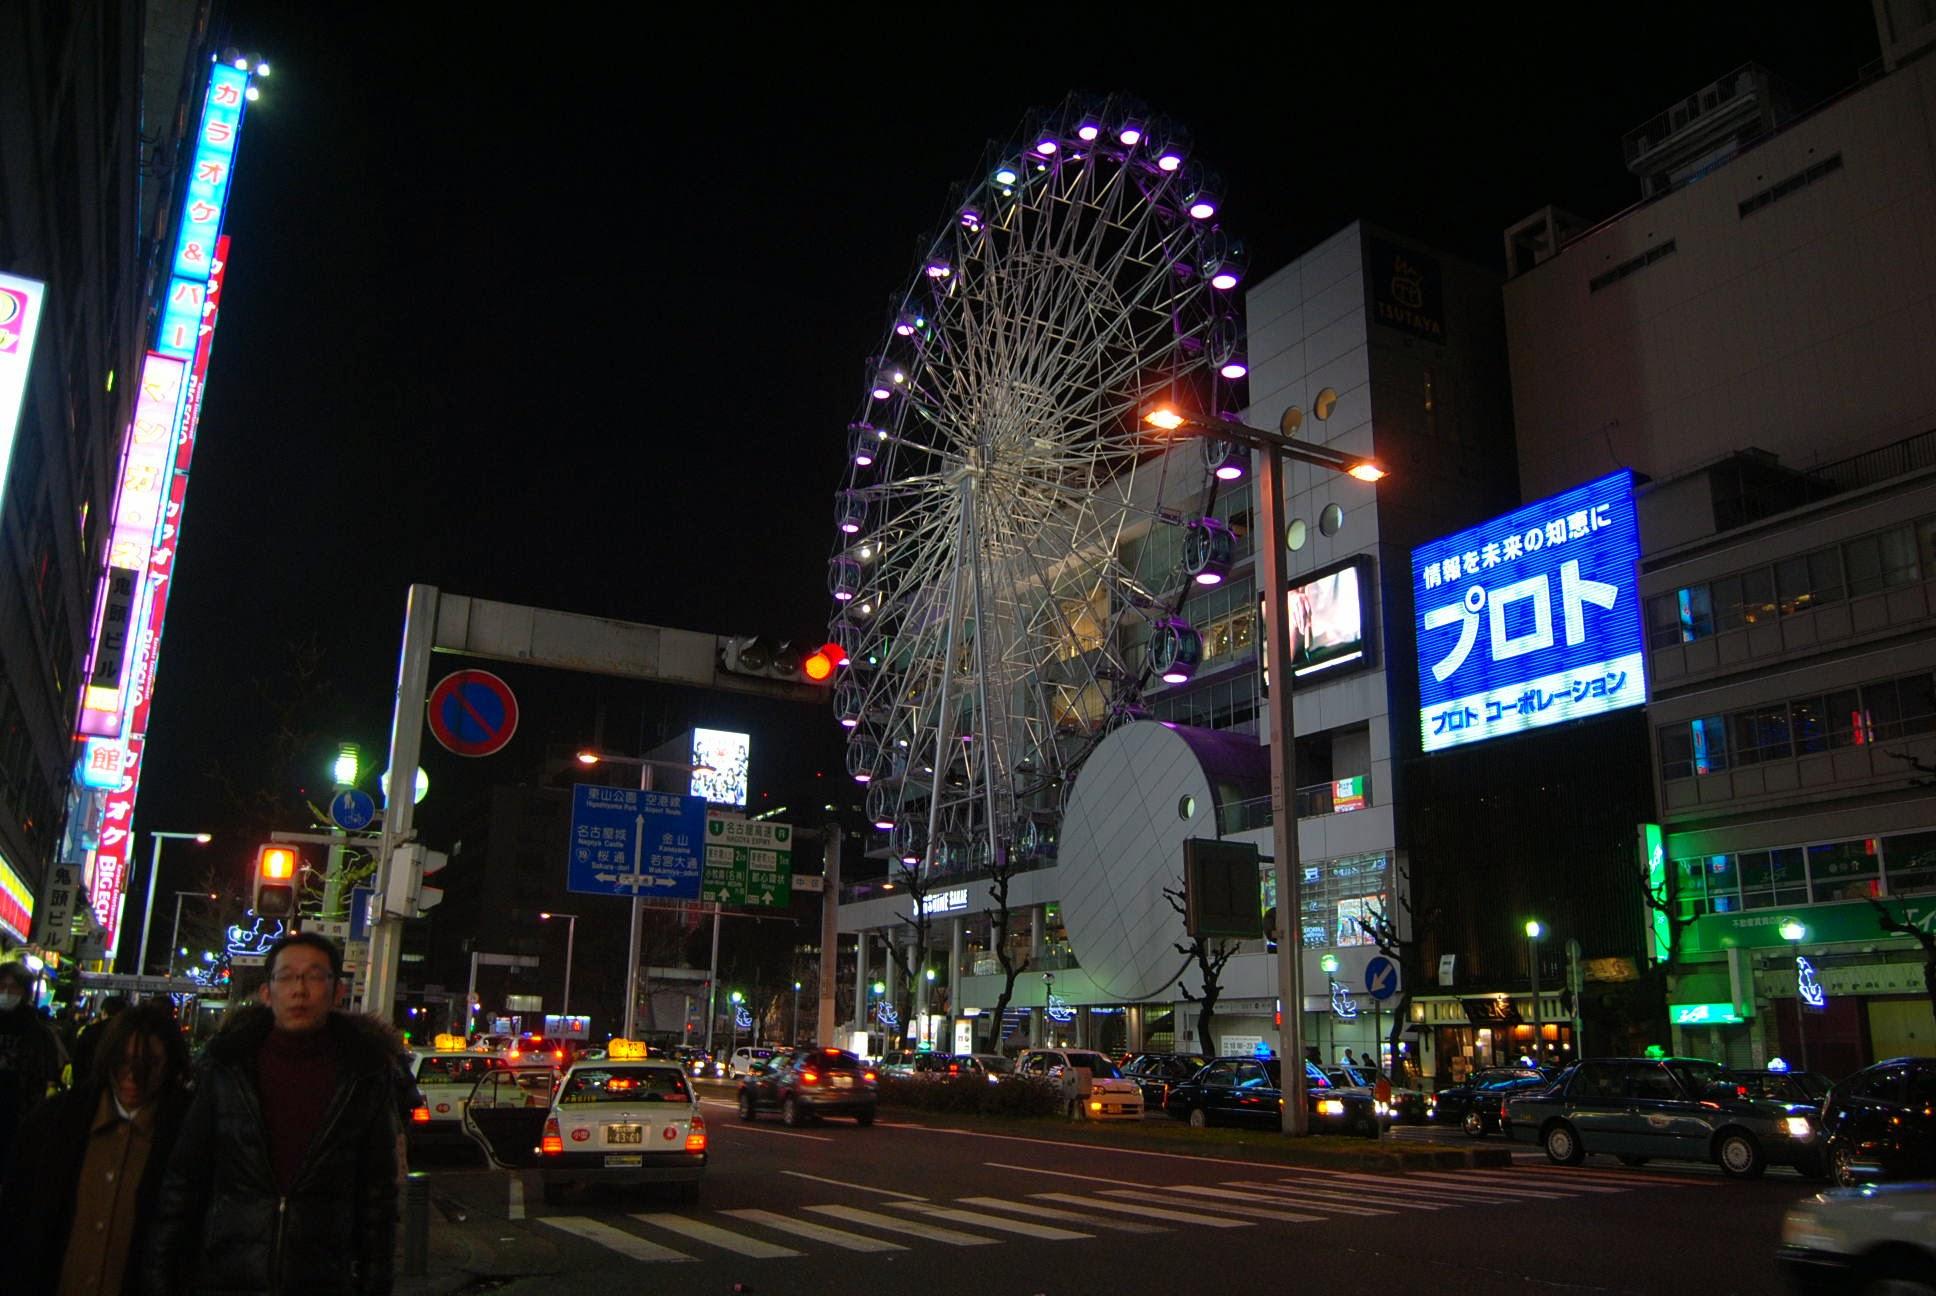 freewalker: 日本中部名古屋自駕遊, 悠閒觀光名古屋3大outlet購物, 浸溫泉, 名古屋自由行之旅